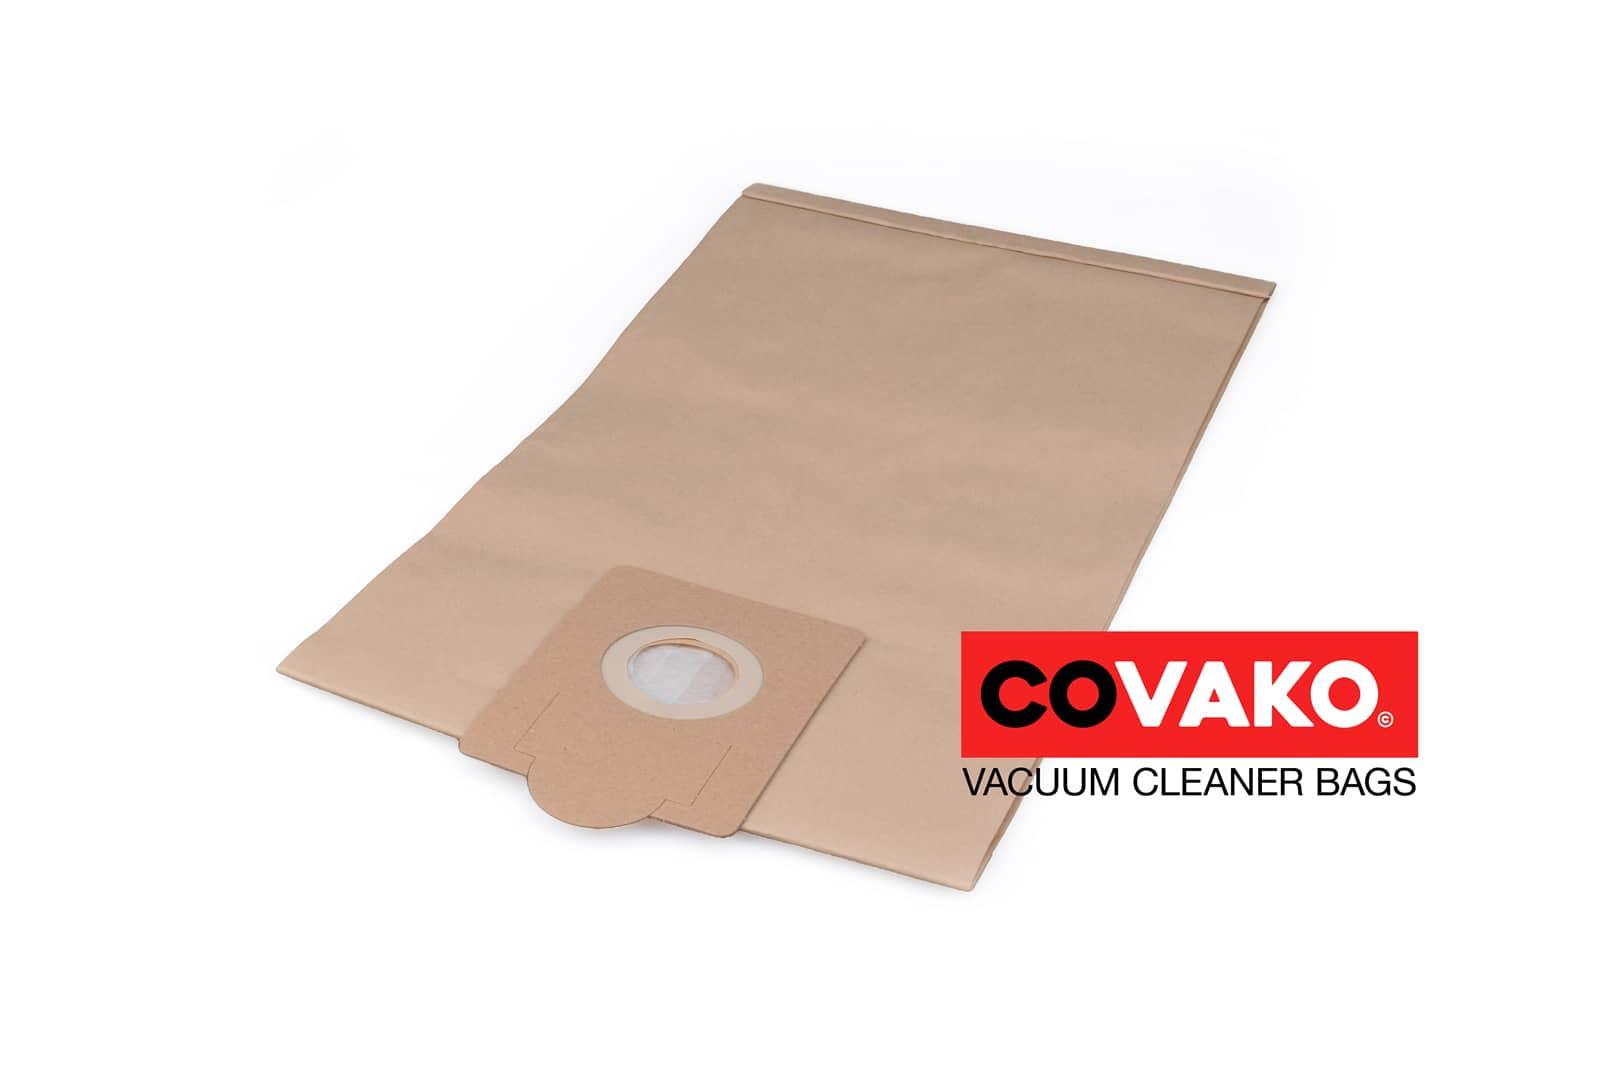 Borema TS 8 / Papier - Borema stofzuigerzakken